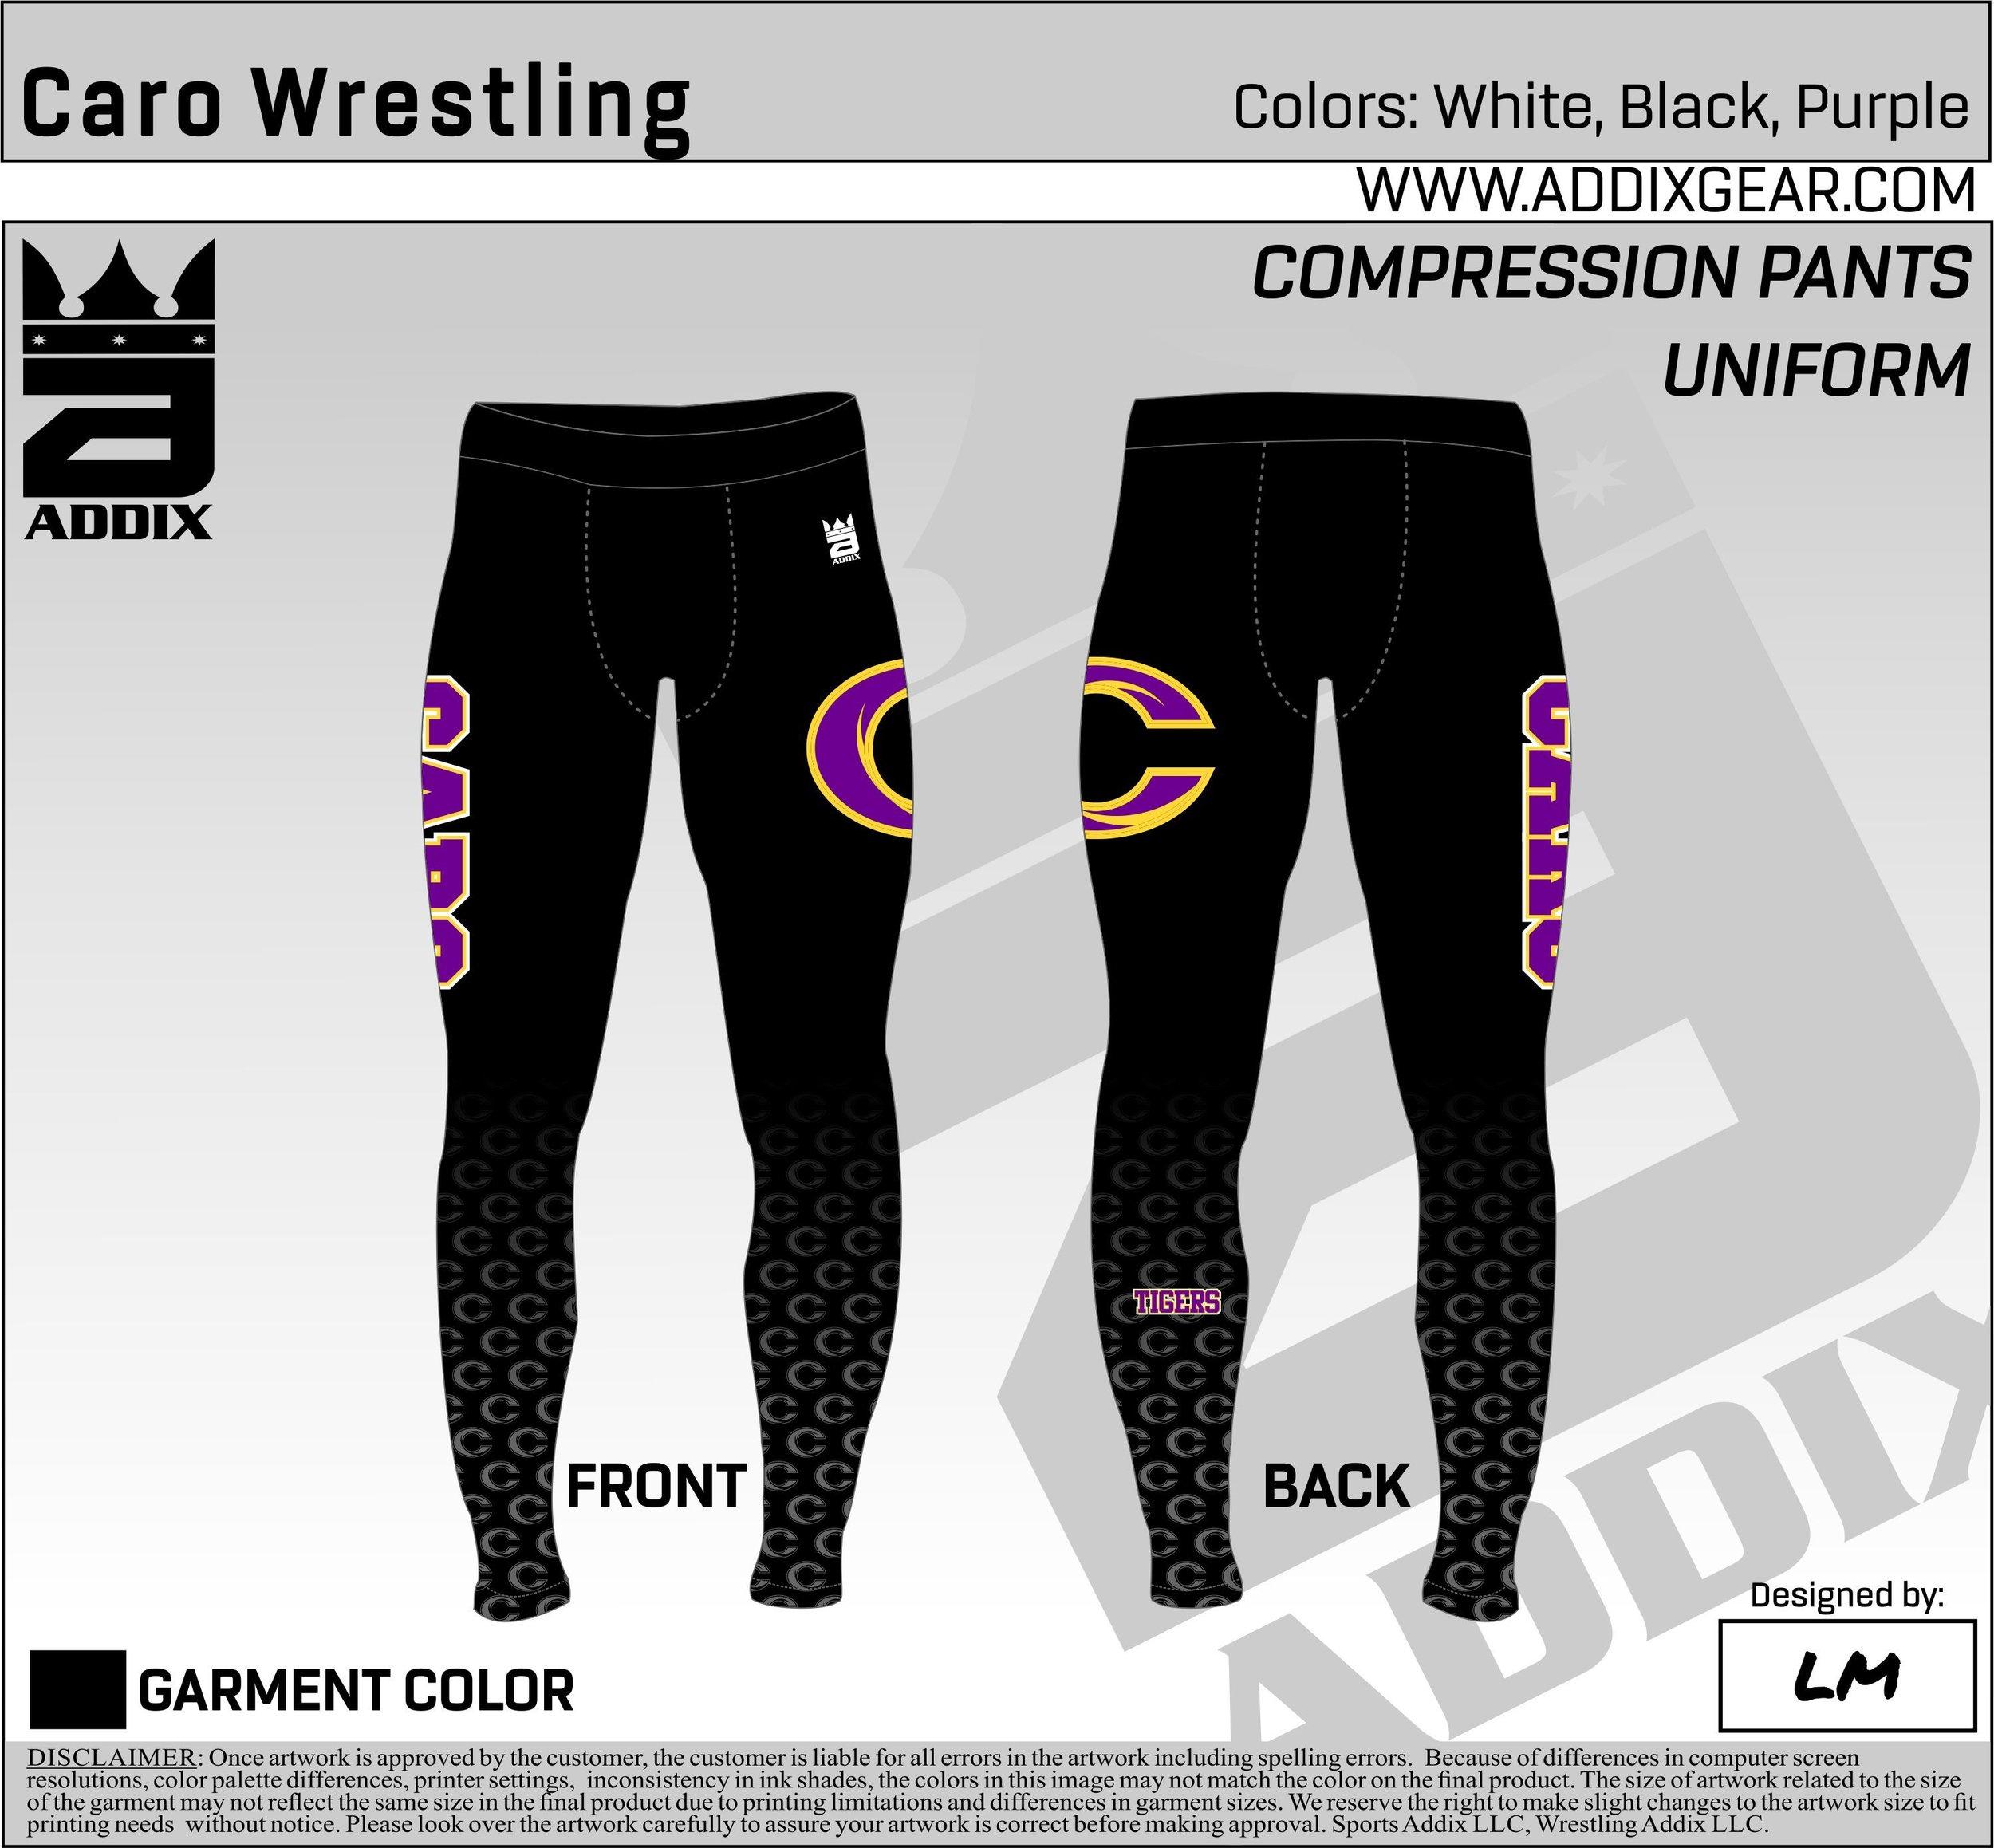 LM_Caro Wrestling_17_11-6_comp pants.jpg